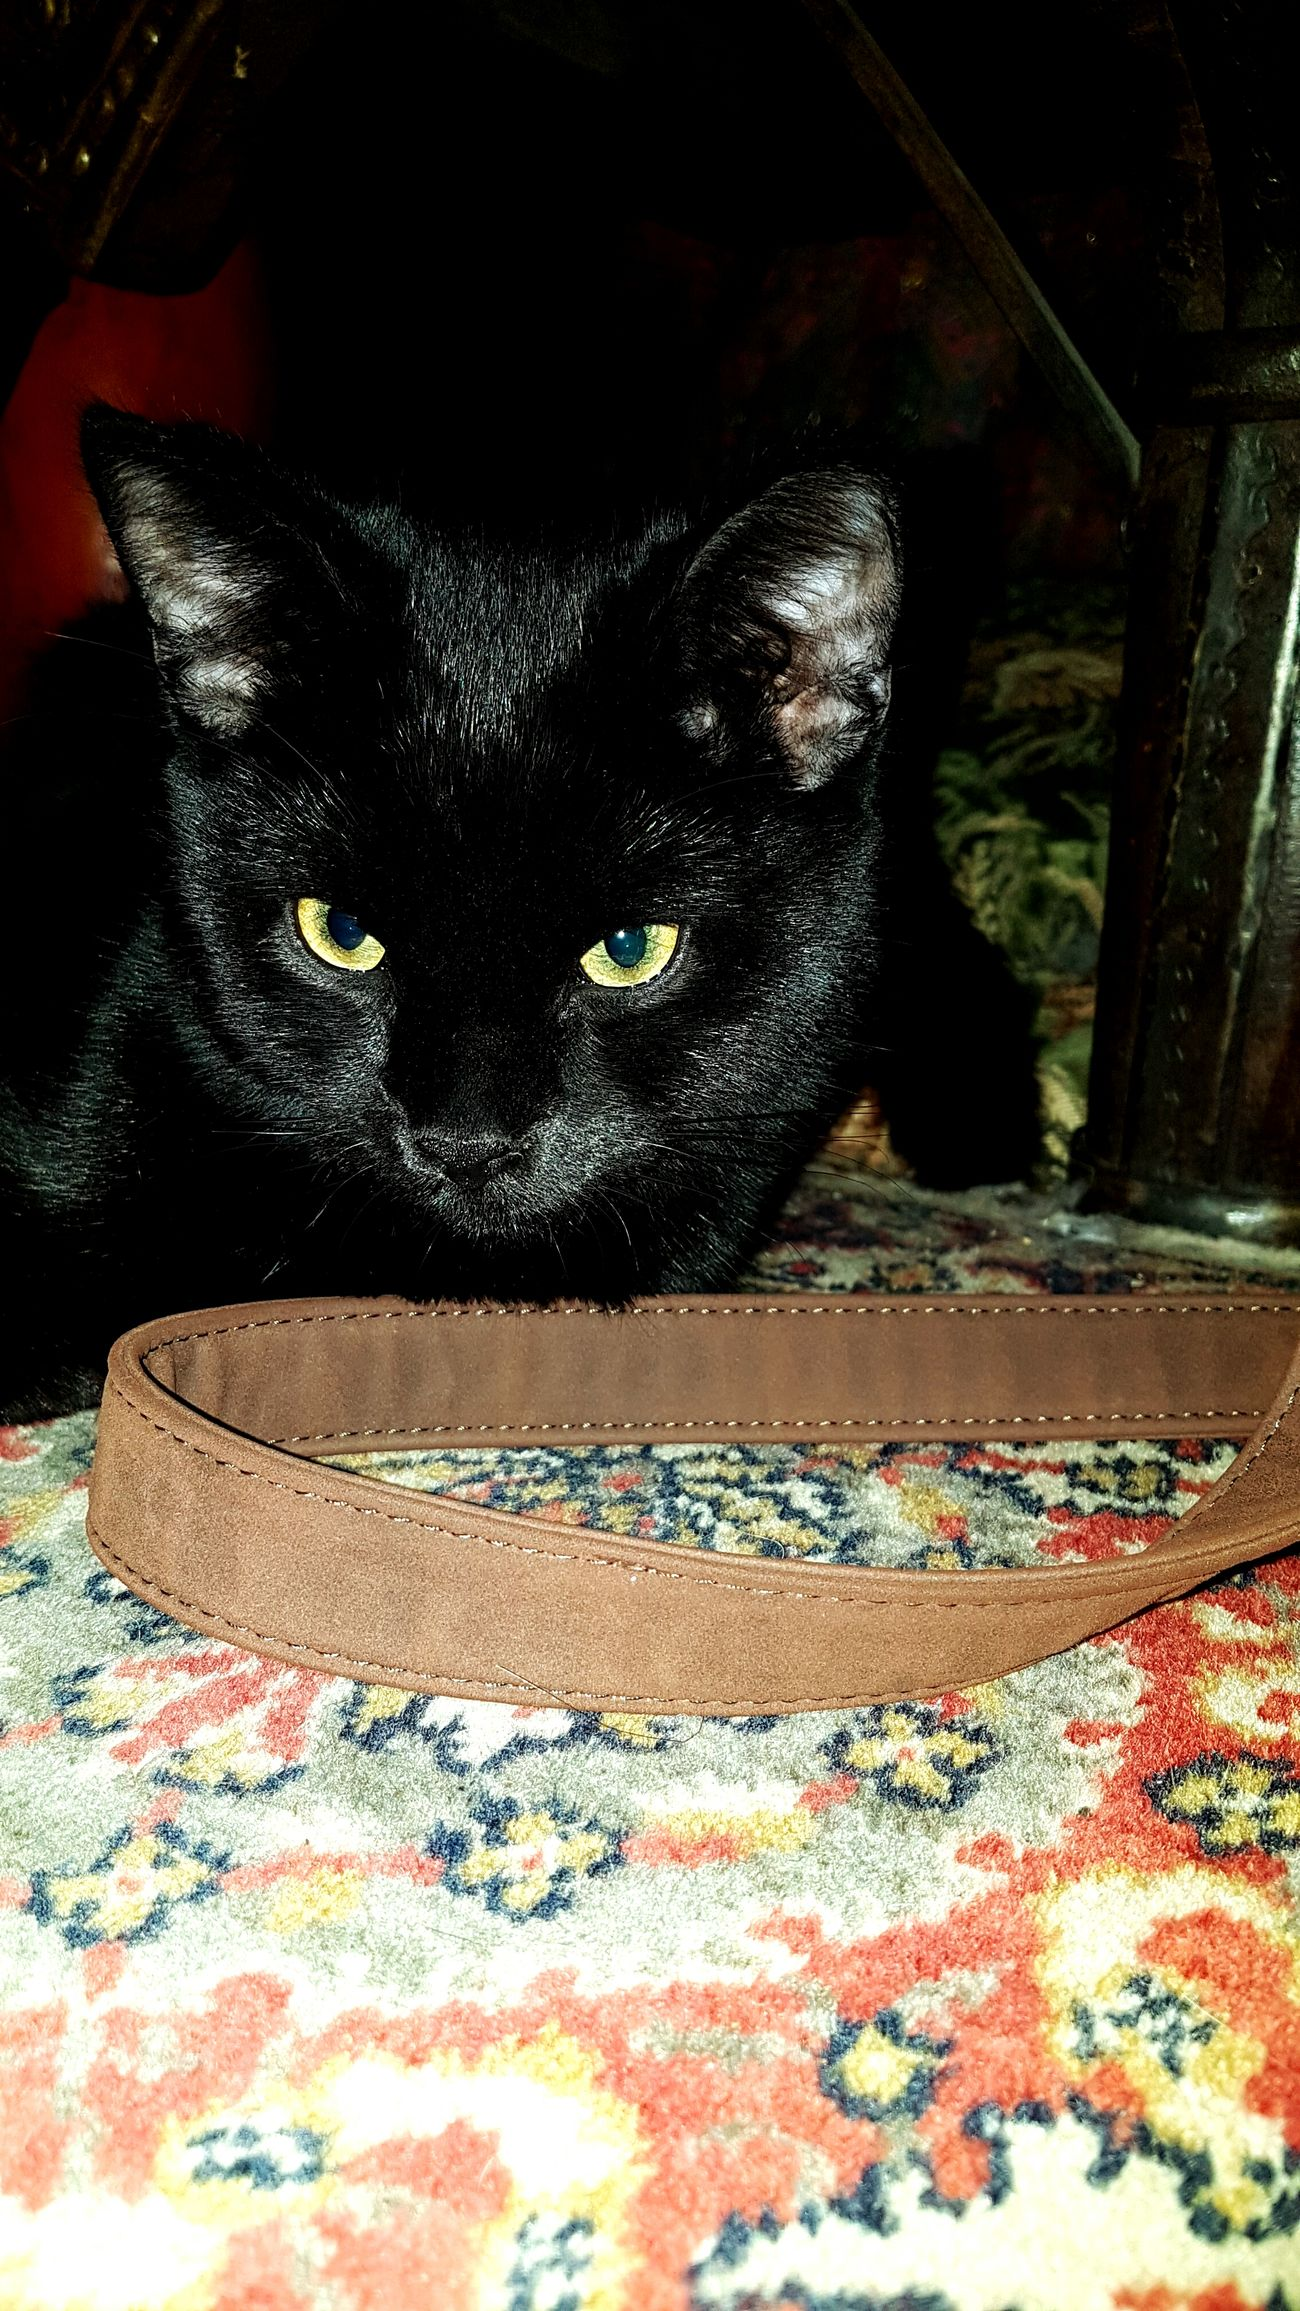 Jos Jedna Divna Maca. 🐱 Meow BLackCat Black Eyes Eyeemcat EyeEmCatlovers Adorable Cats Of EyeEm 💋💋💋💋💋😍😸❤️💖